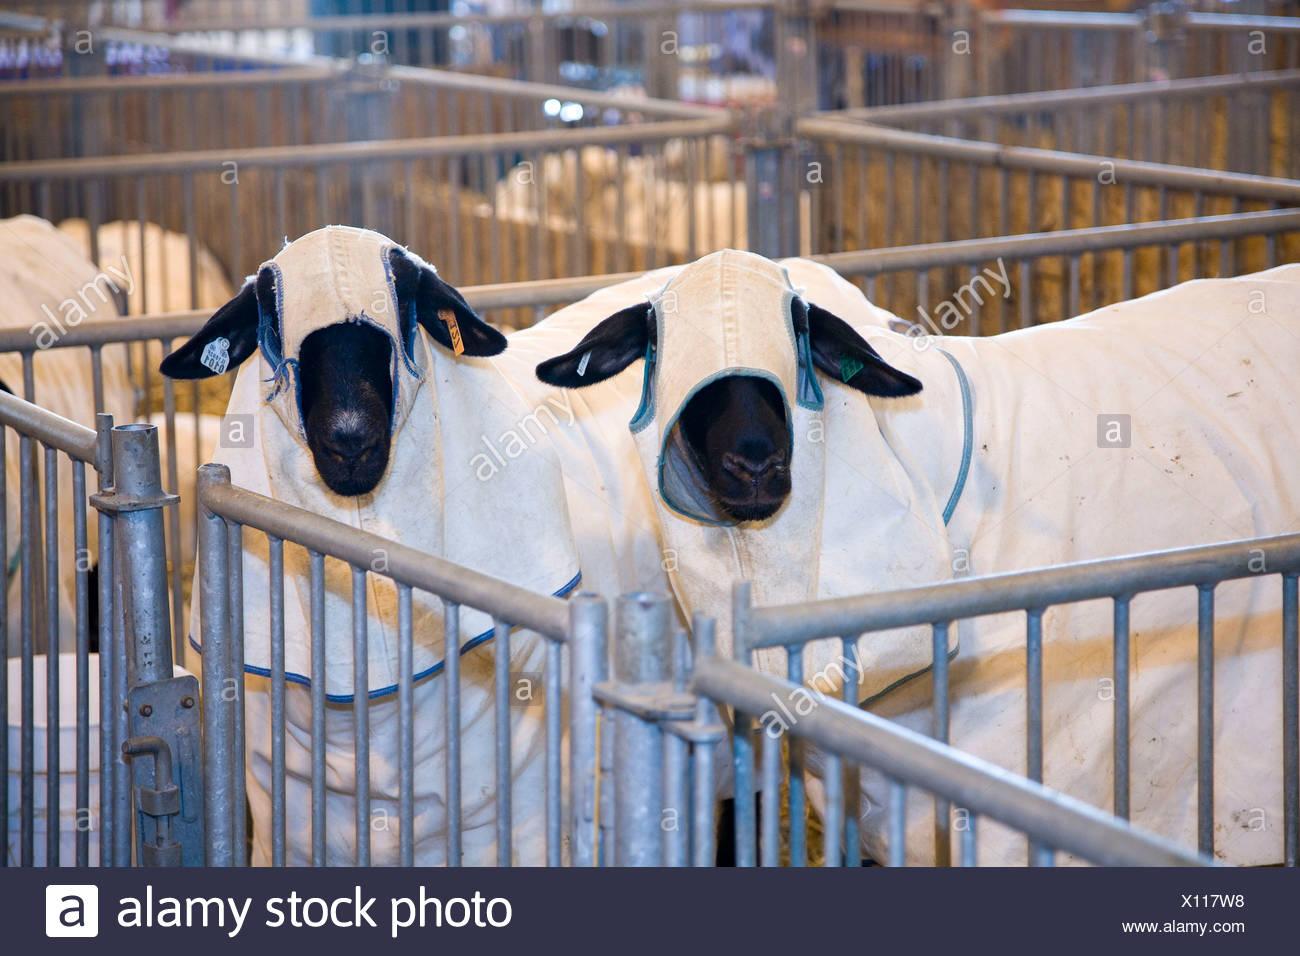 Sheep wearing protective coats at Illinois State Fair. USA - Stock Image